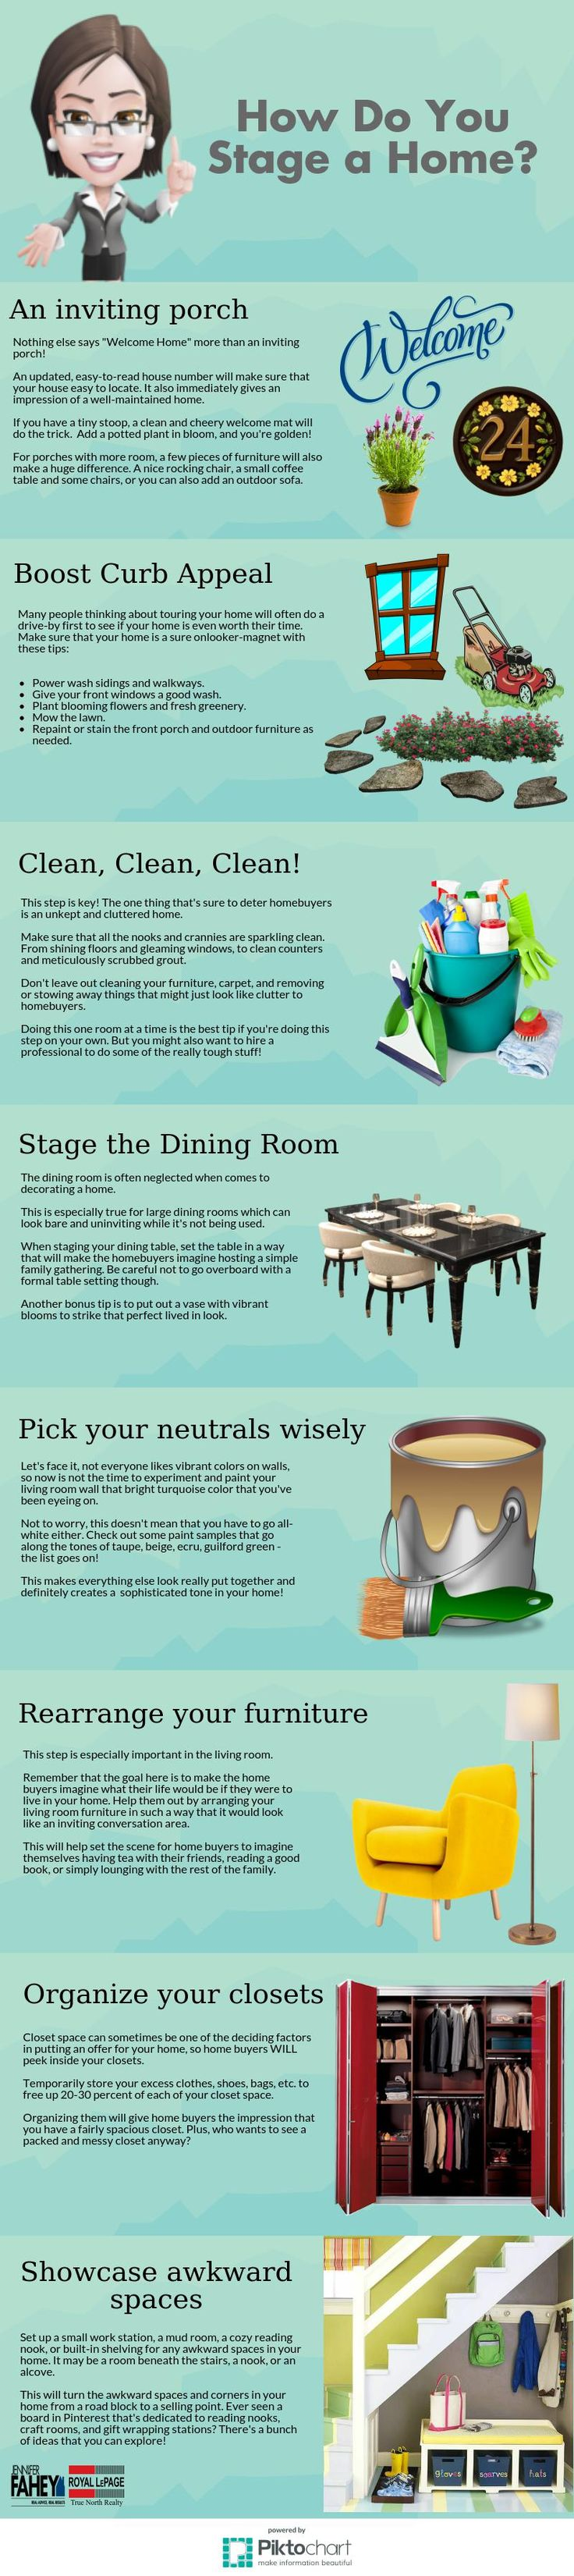 #homestaging #staging #homesforsale #homesellingtips #realestate #realestatetips #blog #infograph